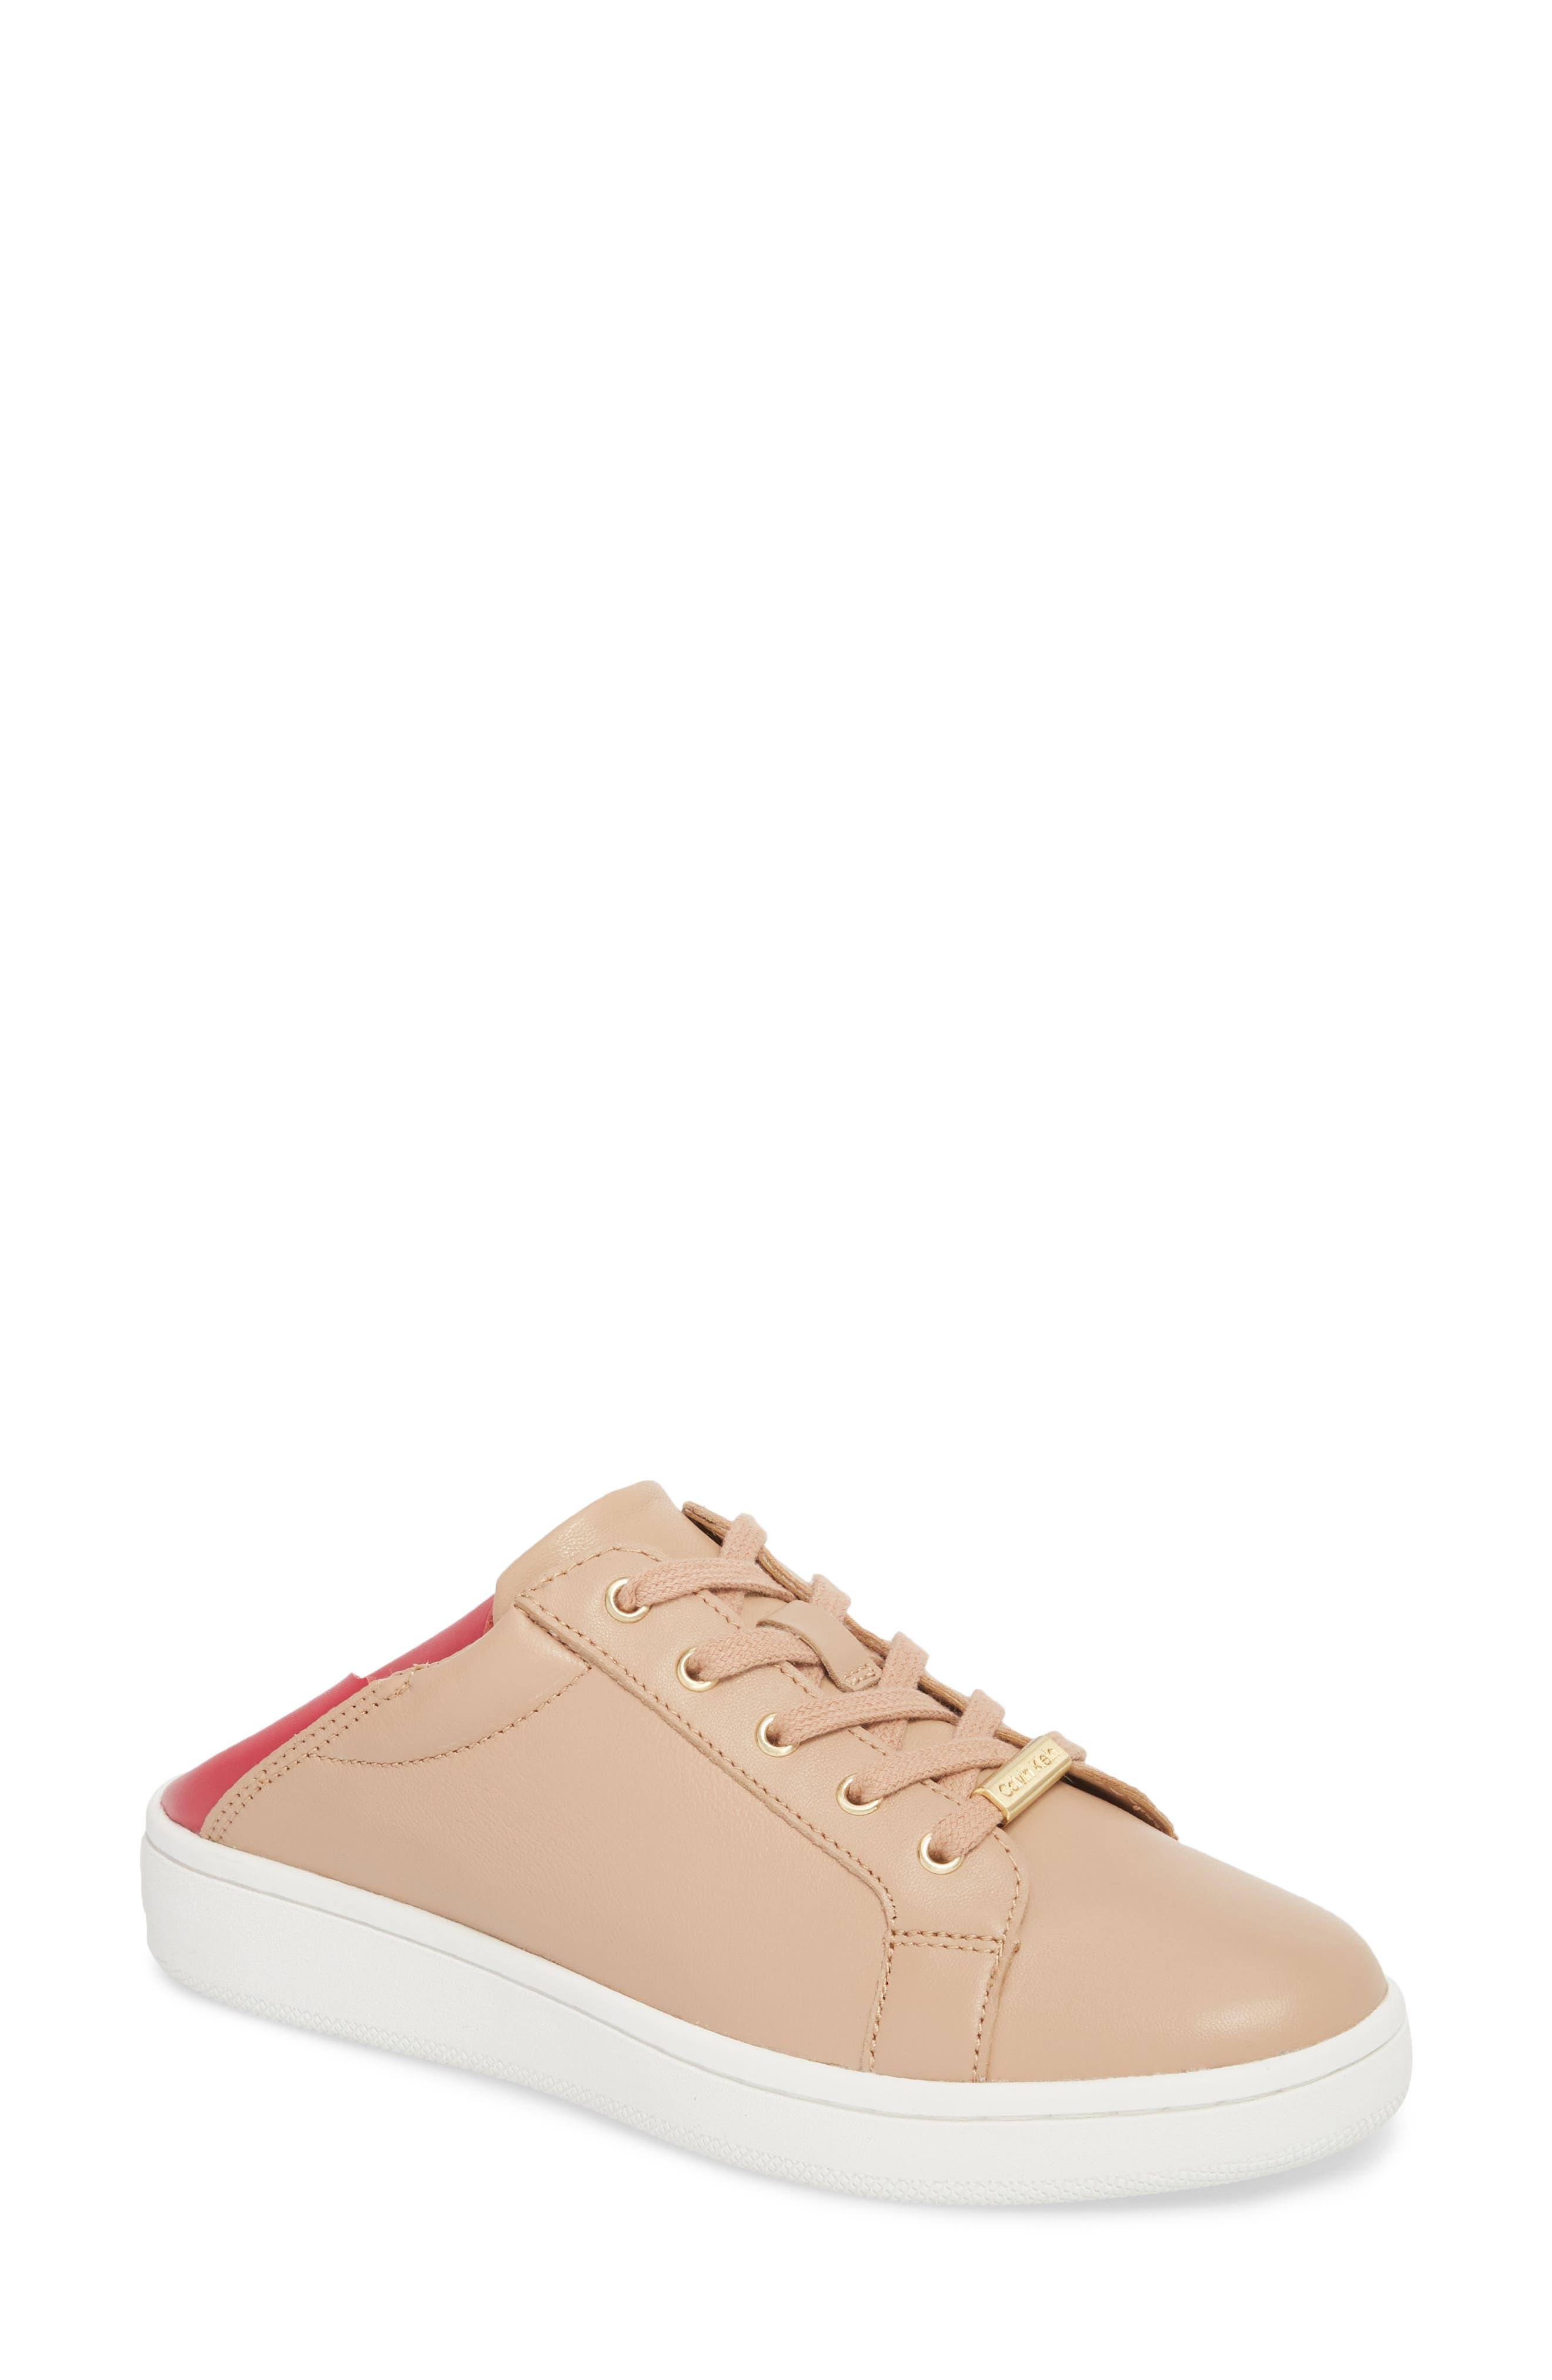 Danica Convertible Sneaker,                             Main thumbnail 1, color,                             Desert Sand Leather